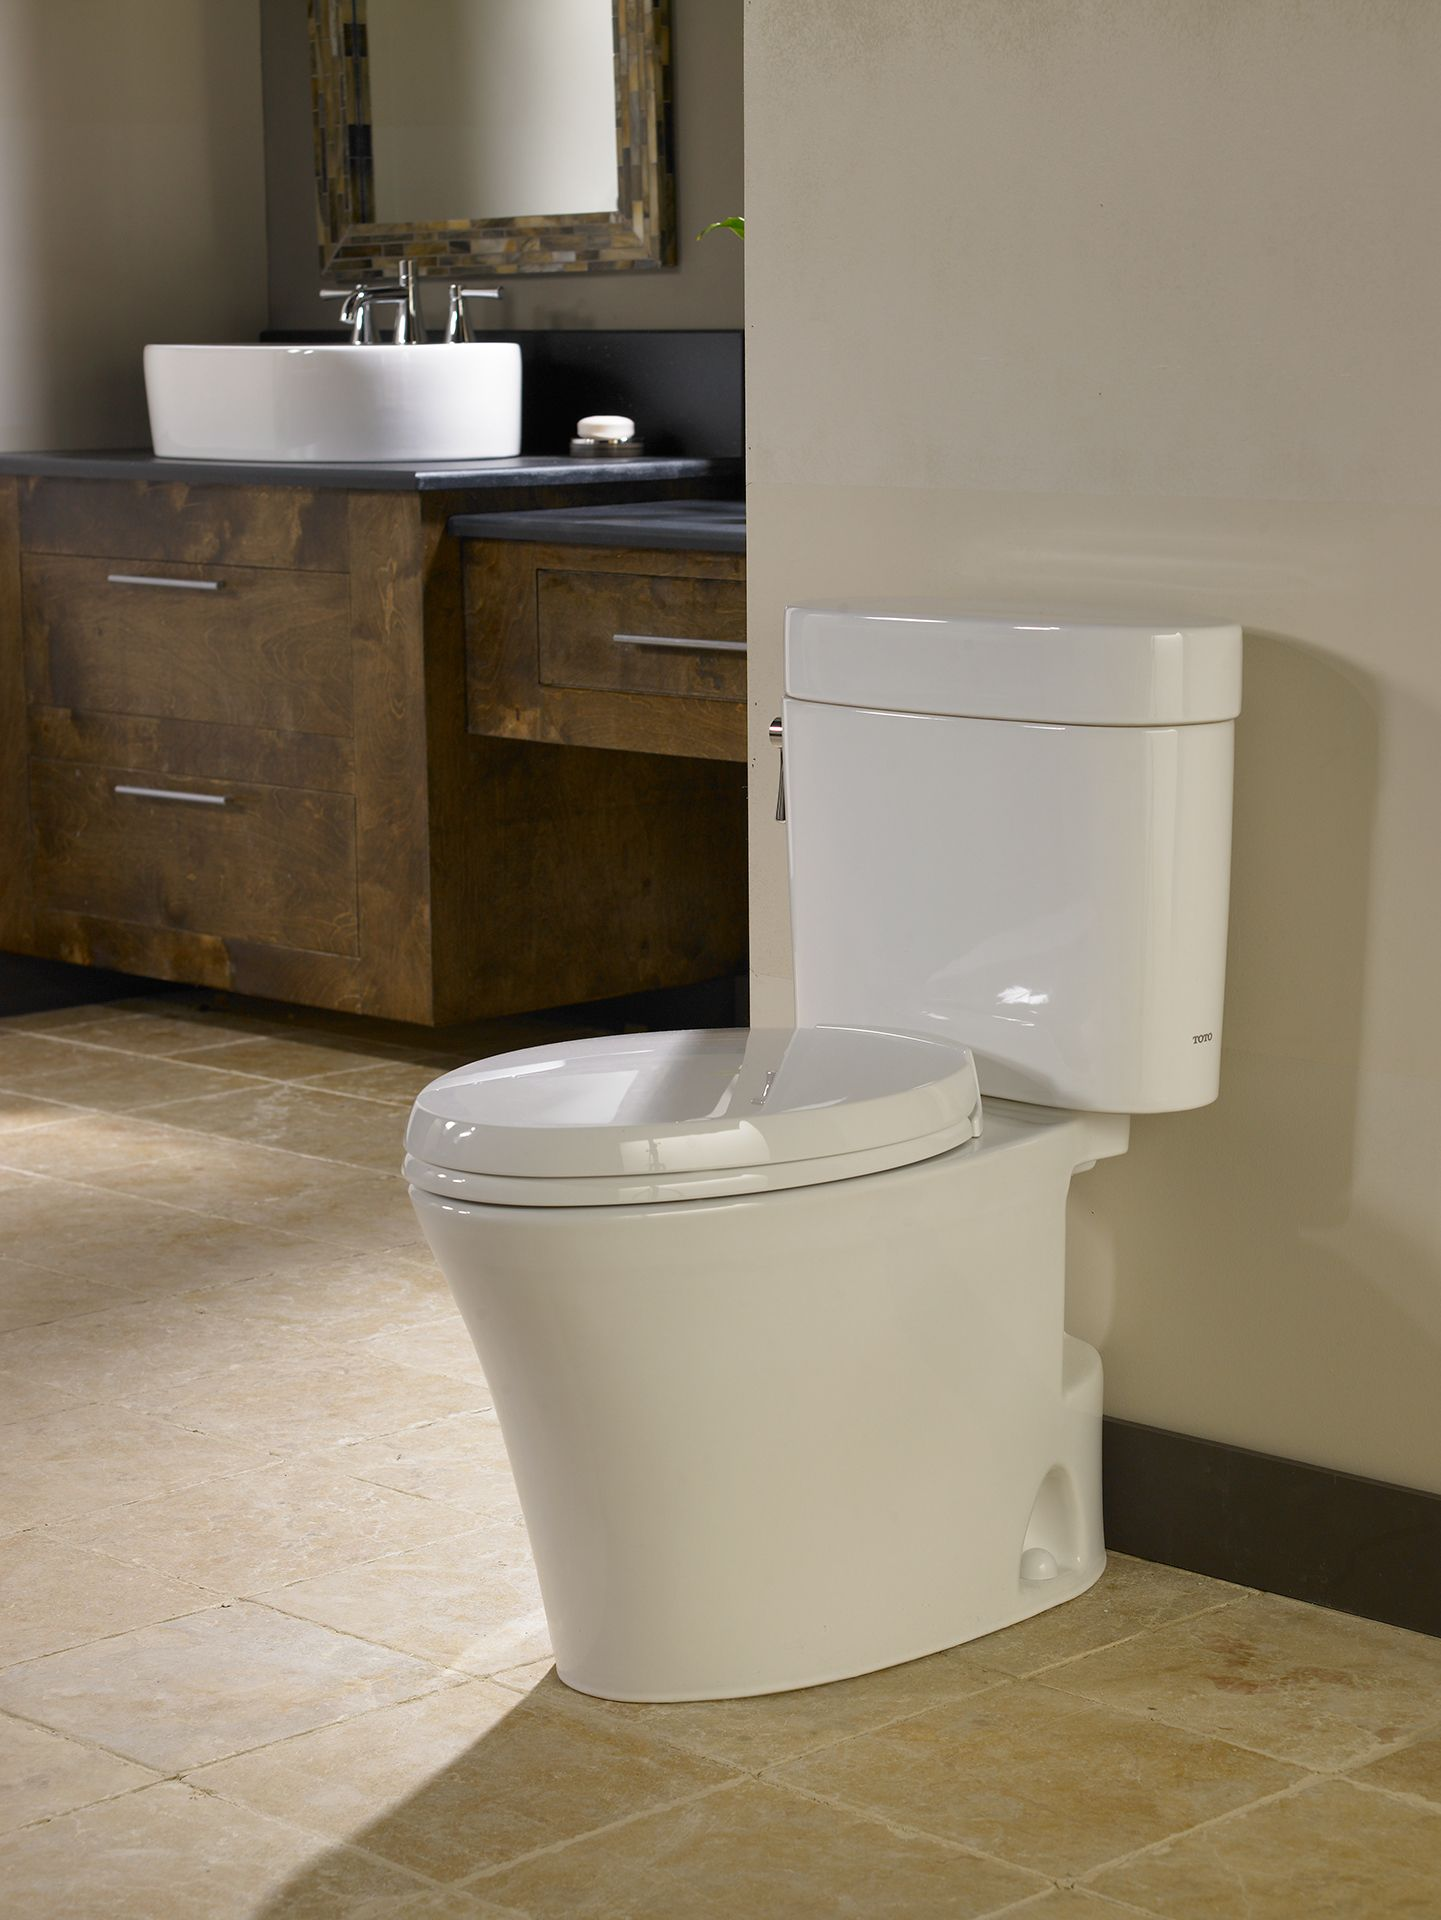 Nexus 174 Two Piece Toilet 1 6 Gpf Elongated Bowl